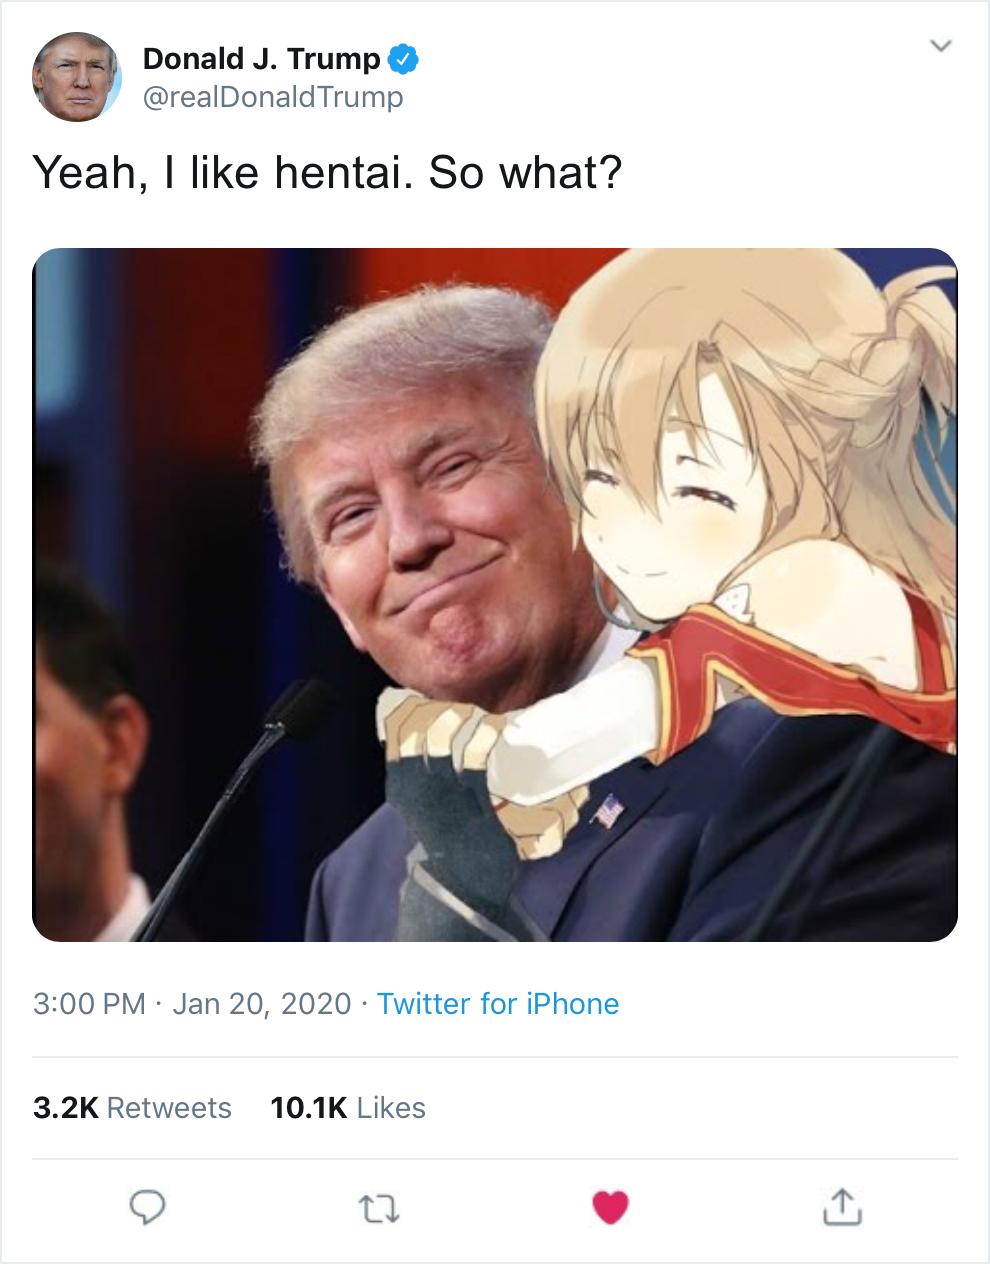 Trump Tweets About Fake Friends Memes Engracados Imagens Aleatorias Imagens Memes